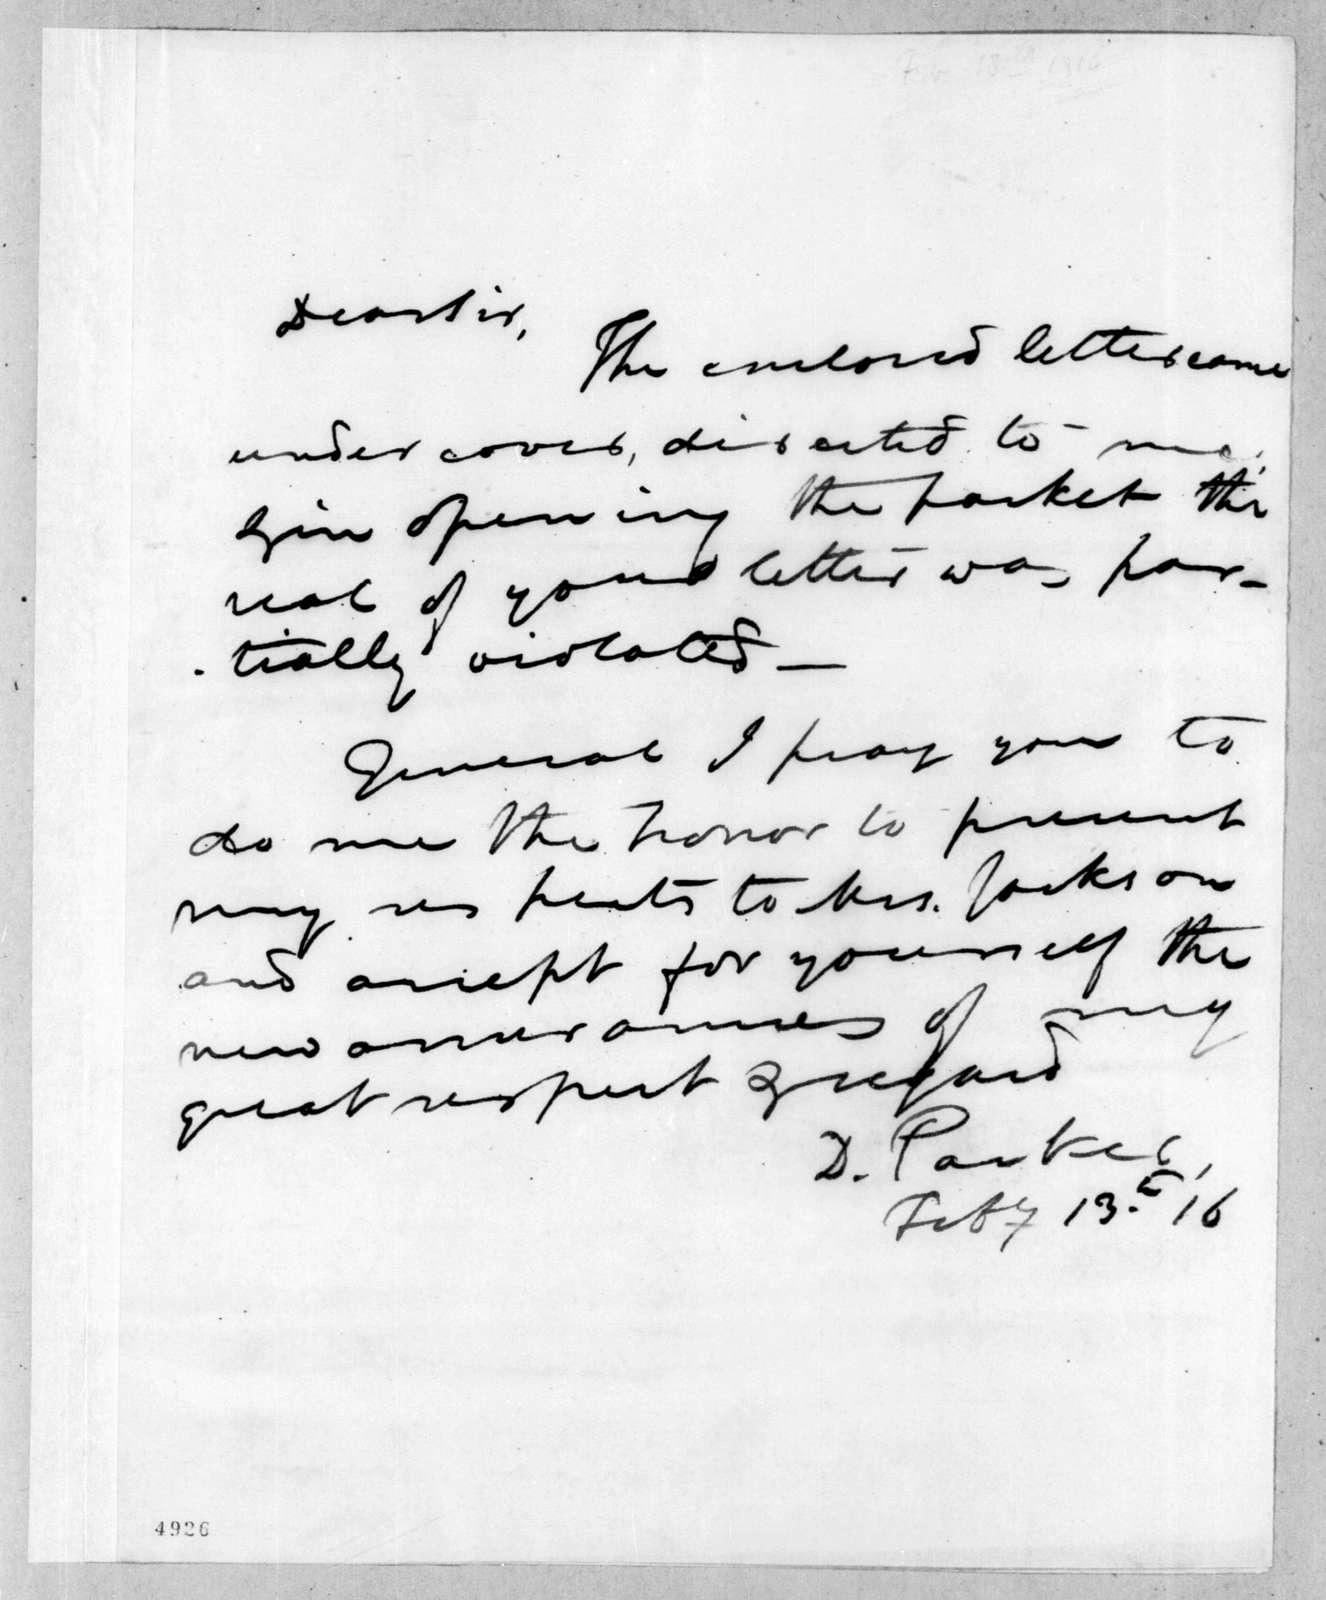 Daniel Parker to Andrew Jackson, February 13, 1816